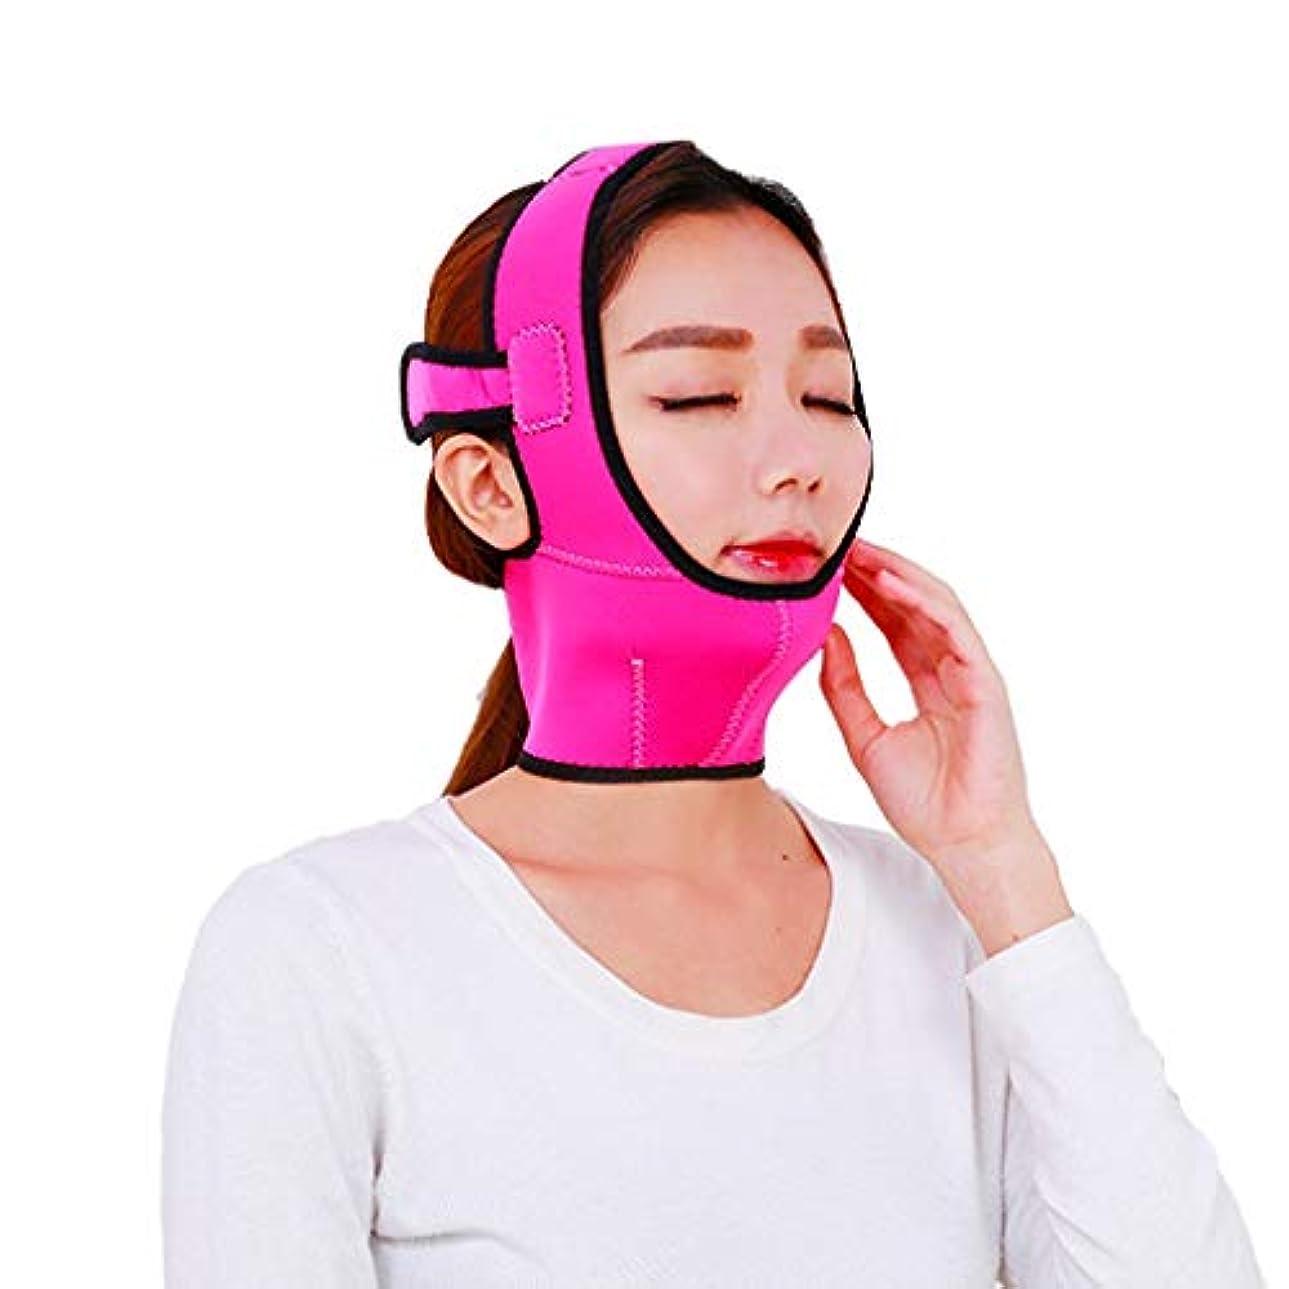 Jia He 軽量 マスクフェイスリフティング二重あごネックV-顔アーティファクトアンチリンクル通気性睡眠包帯を持ち上げる薄い顔ベルト、フェイス ## (Color : Rose red)